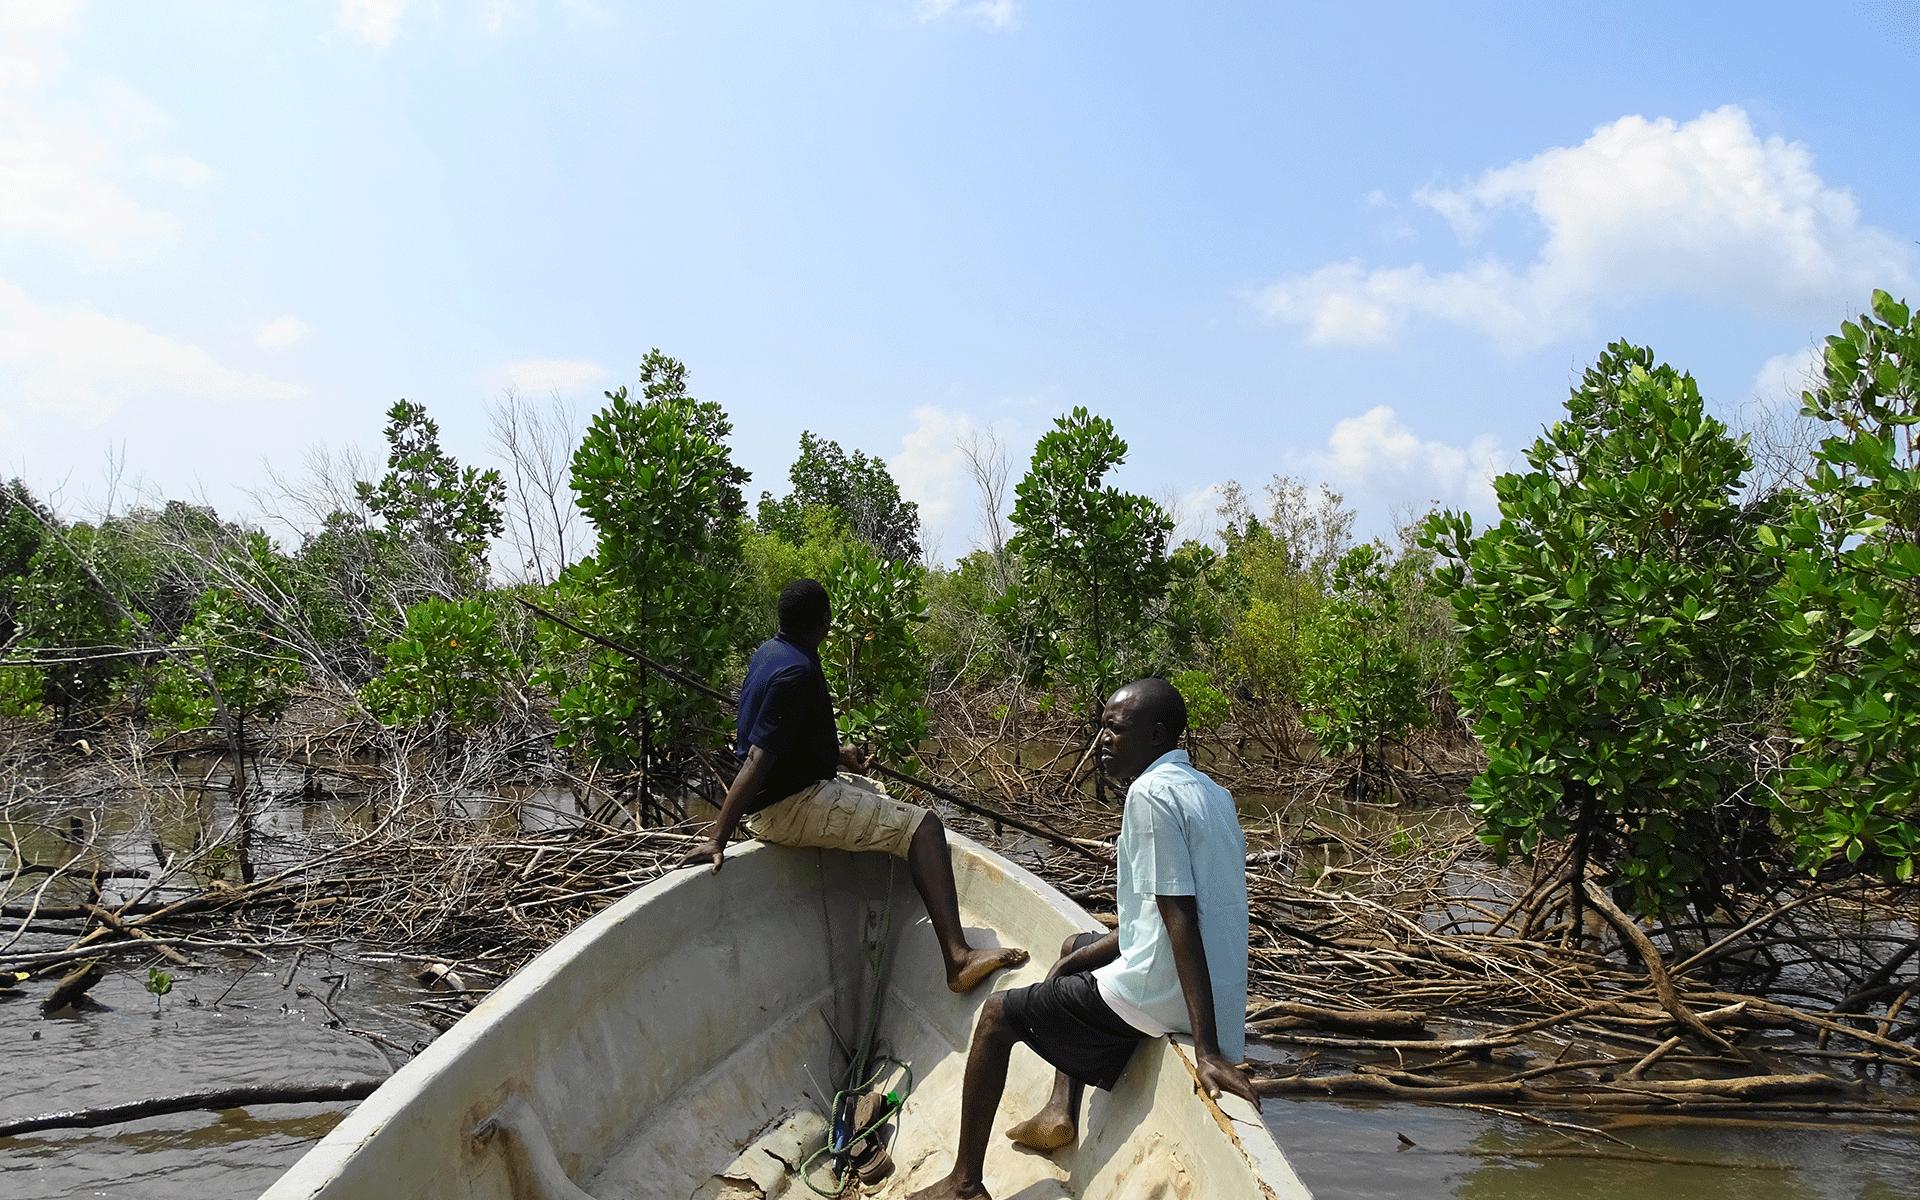 Mangrove conservation and restoration in Giriama (Robinson) Island, Kenya. Photo credit: Seacology